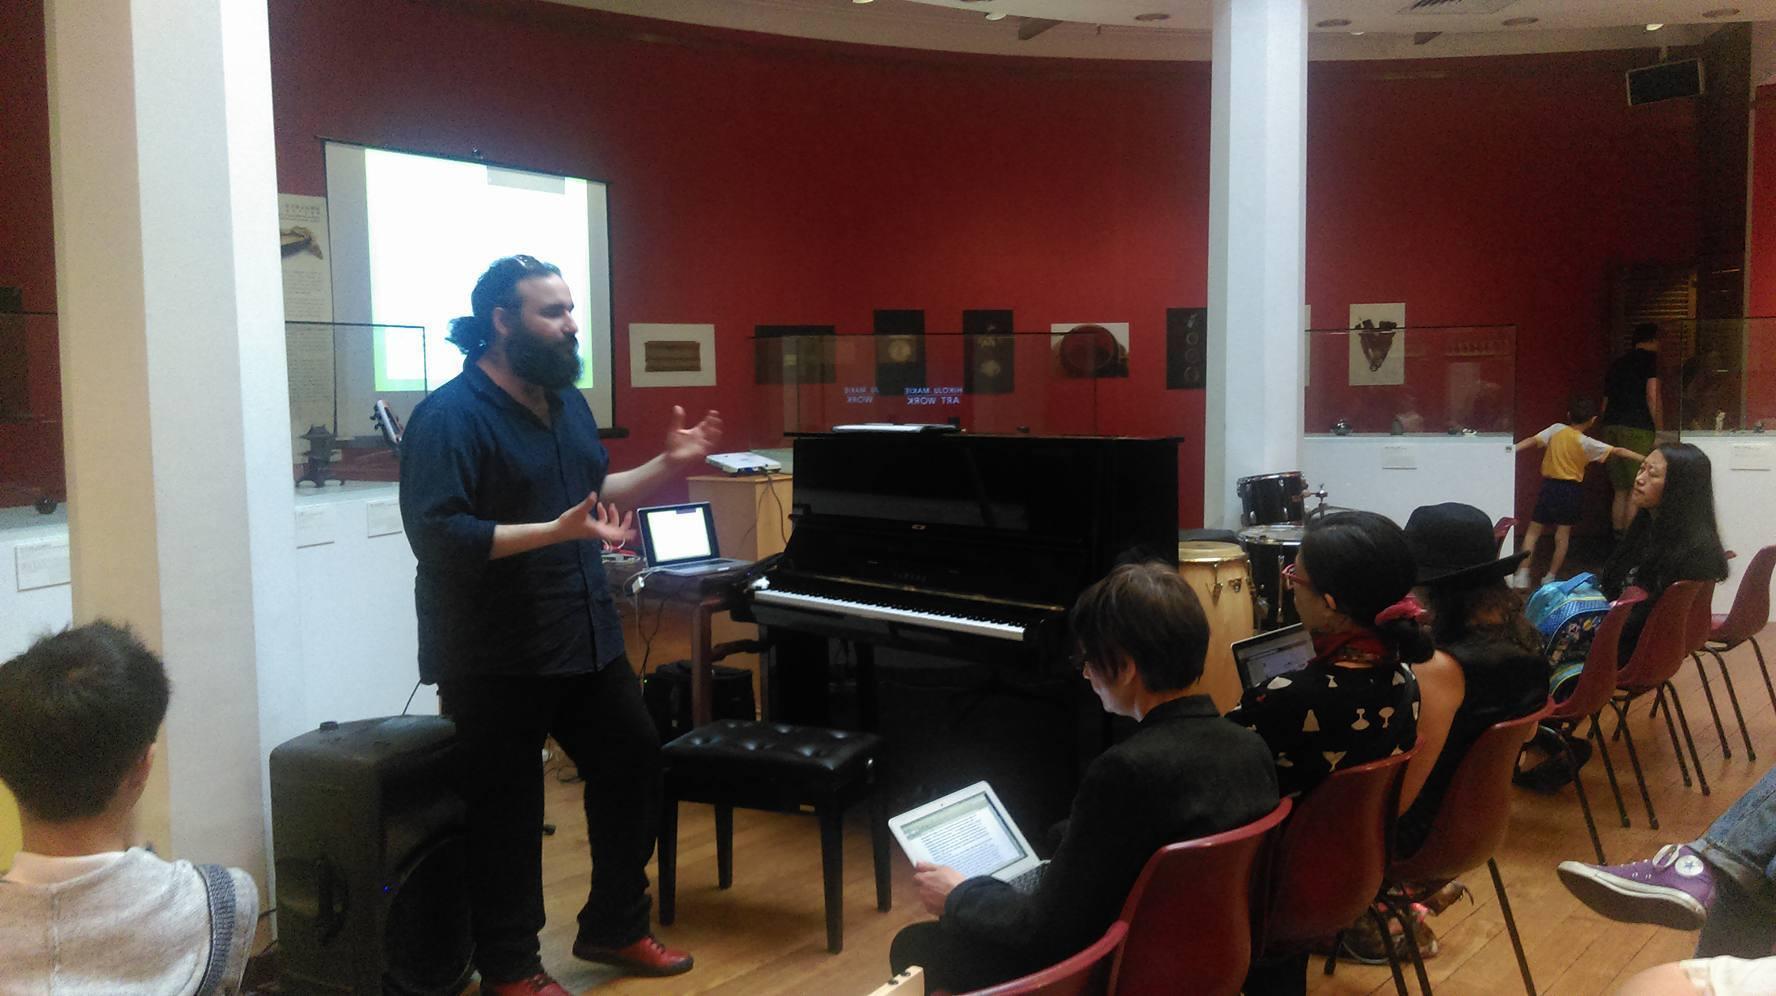 lecturing hong kong university museum.jpg